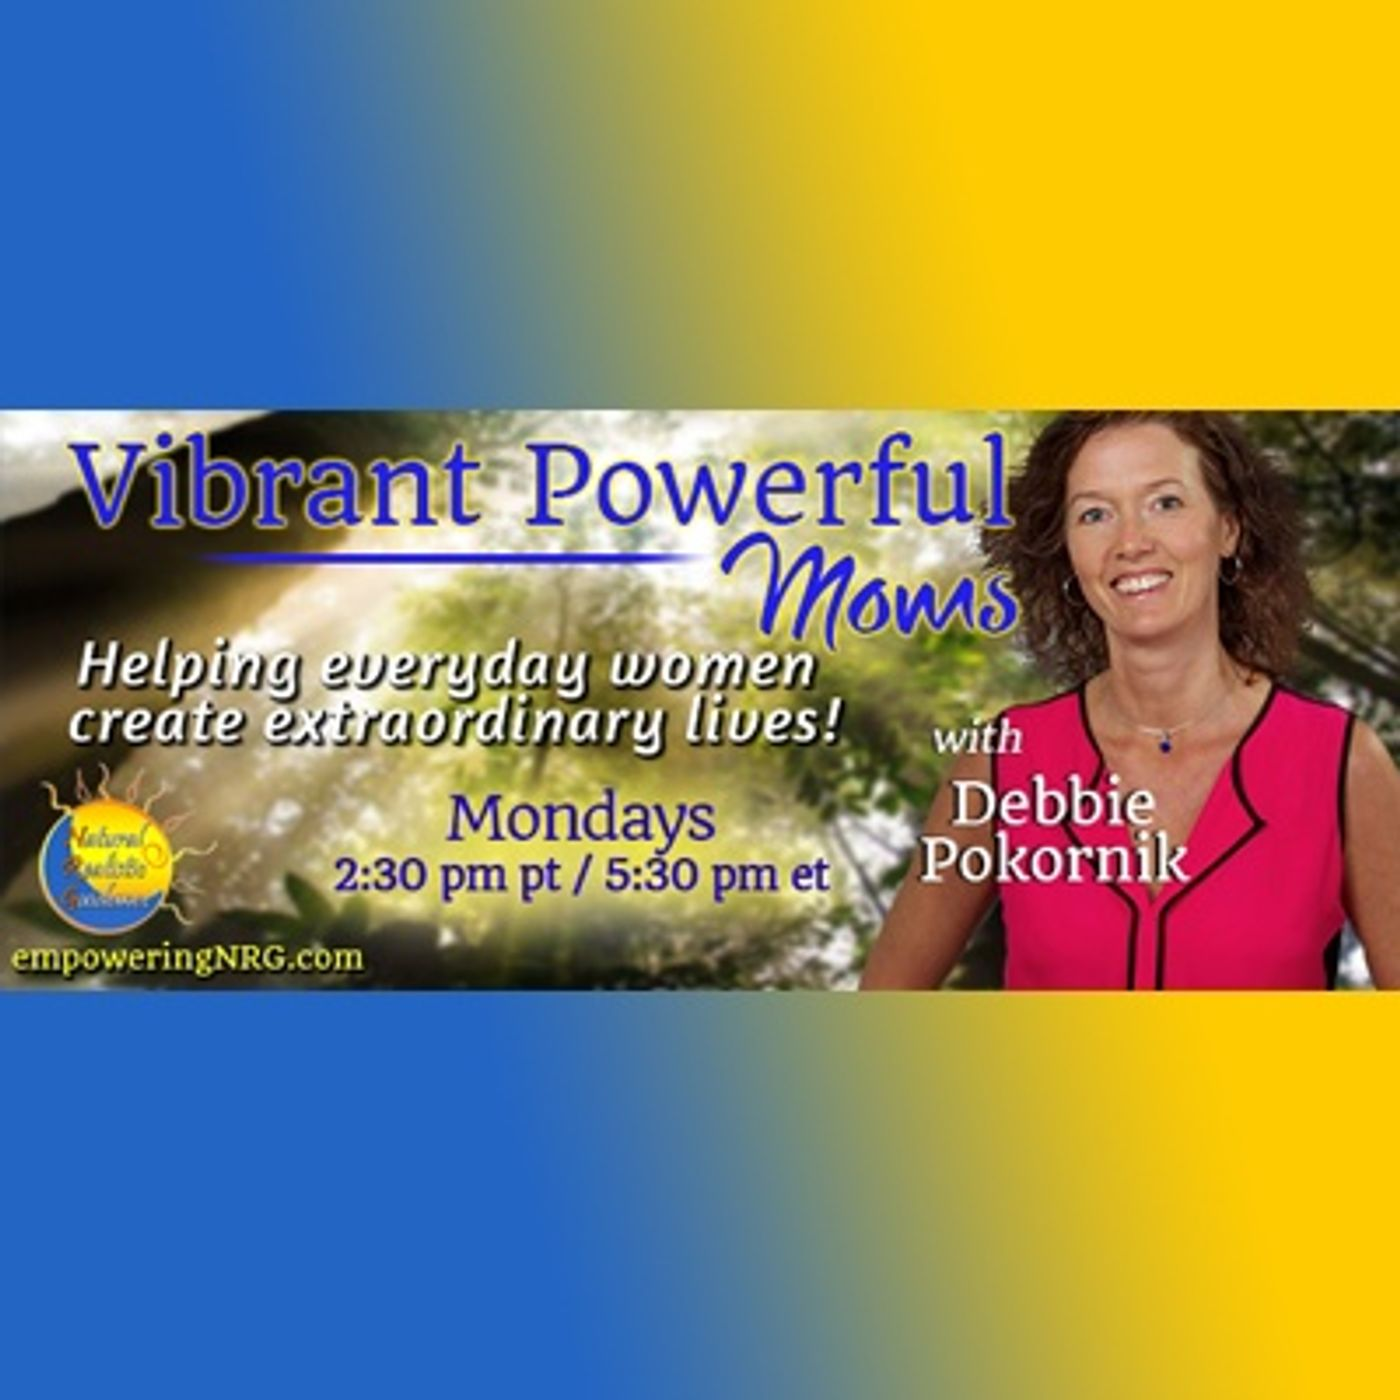 Vibrant Powerful Moms